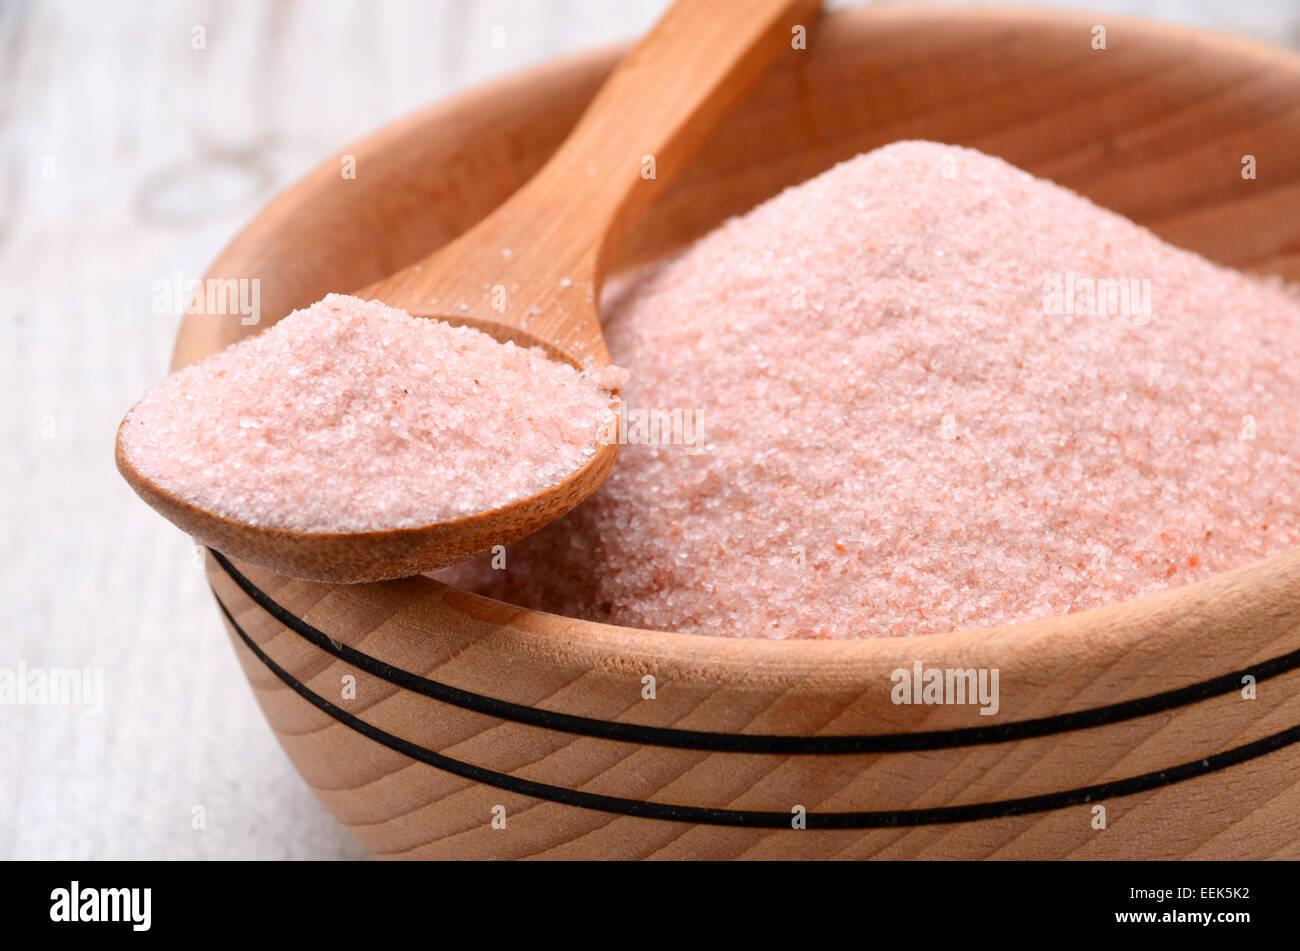 Himalayan pink crystal salt high resolution image - Stock Image